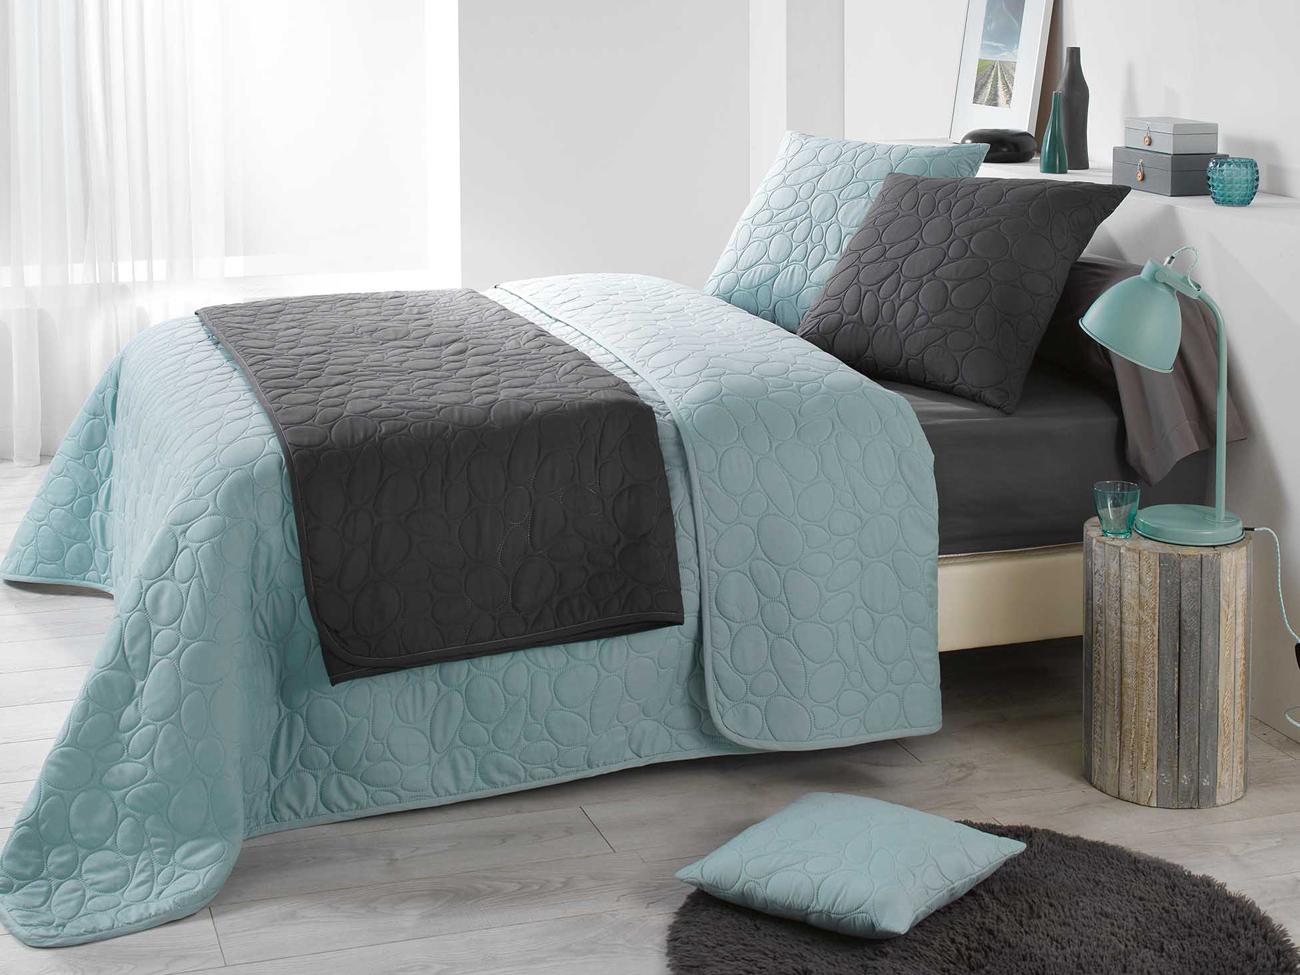 francuskie narzuty na ko. Black Bedroom Furniture Sets. Home Design Ideas